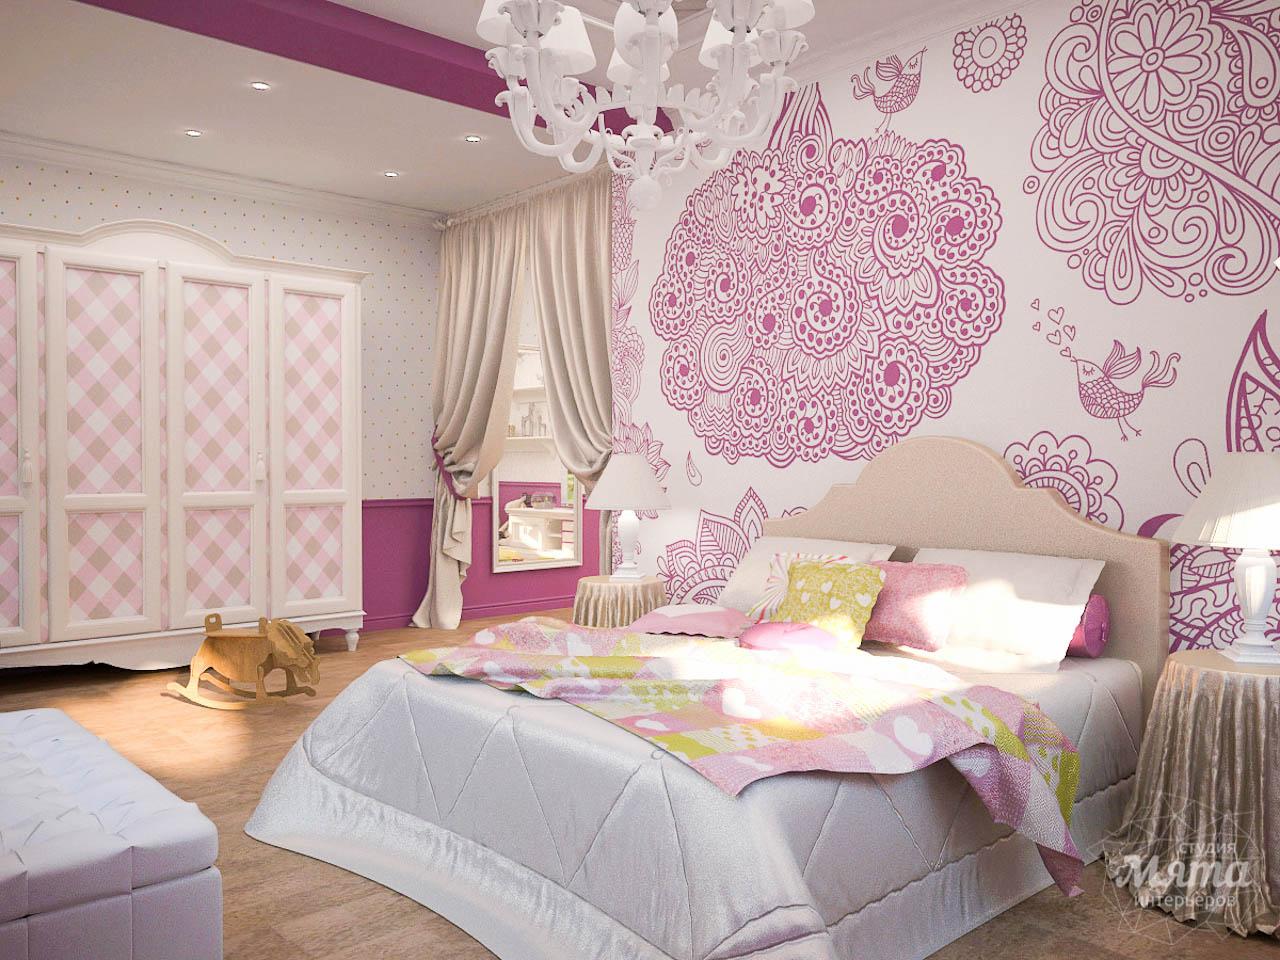 Дизайн интерьера коттеджа по ул. Ландышевая 23 img1503839259